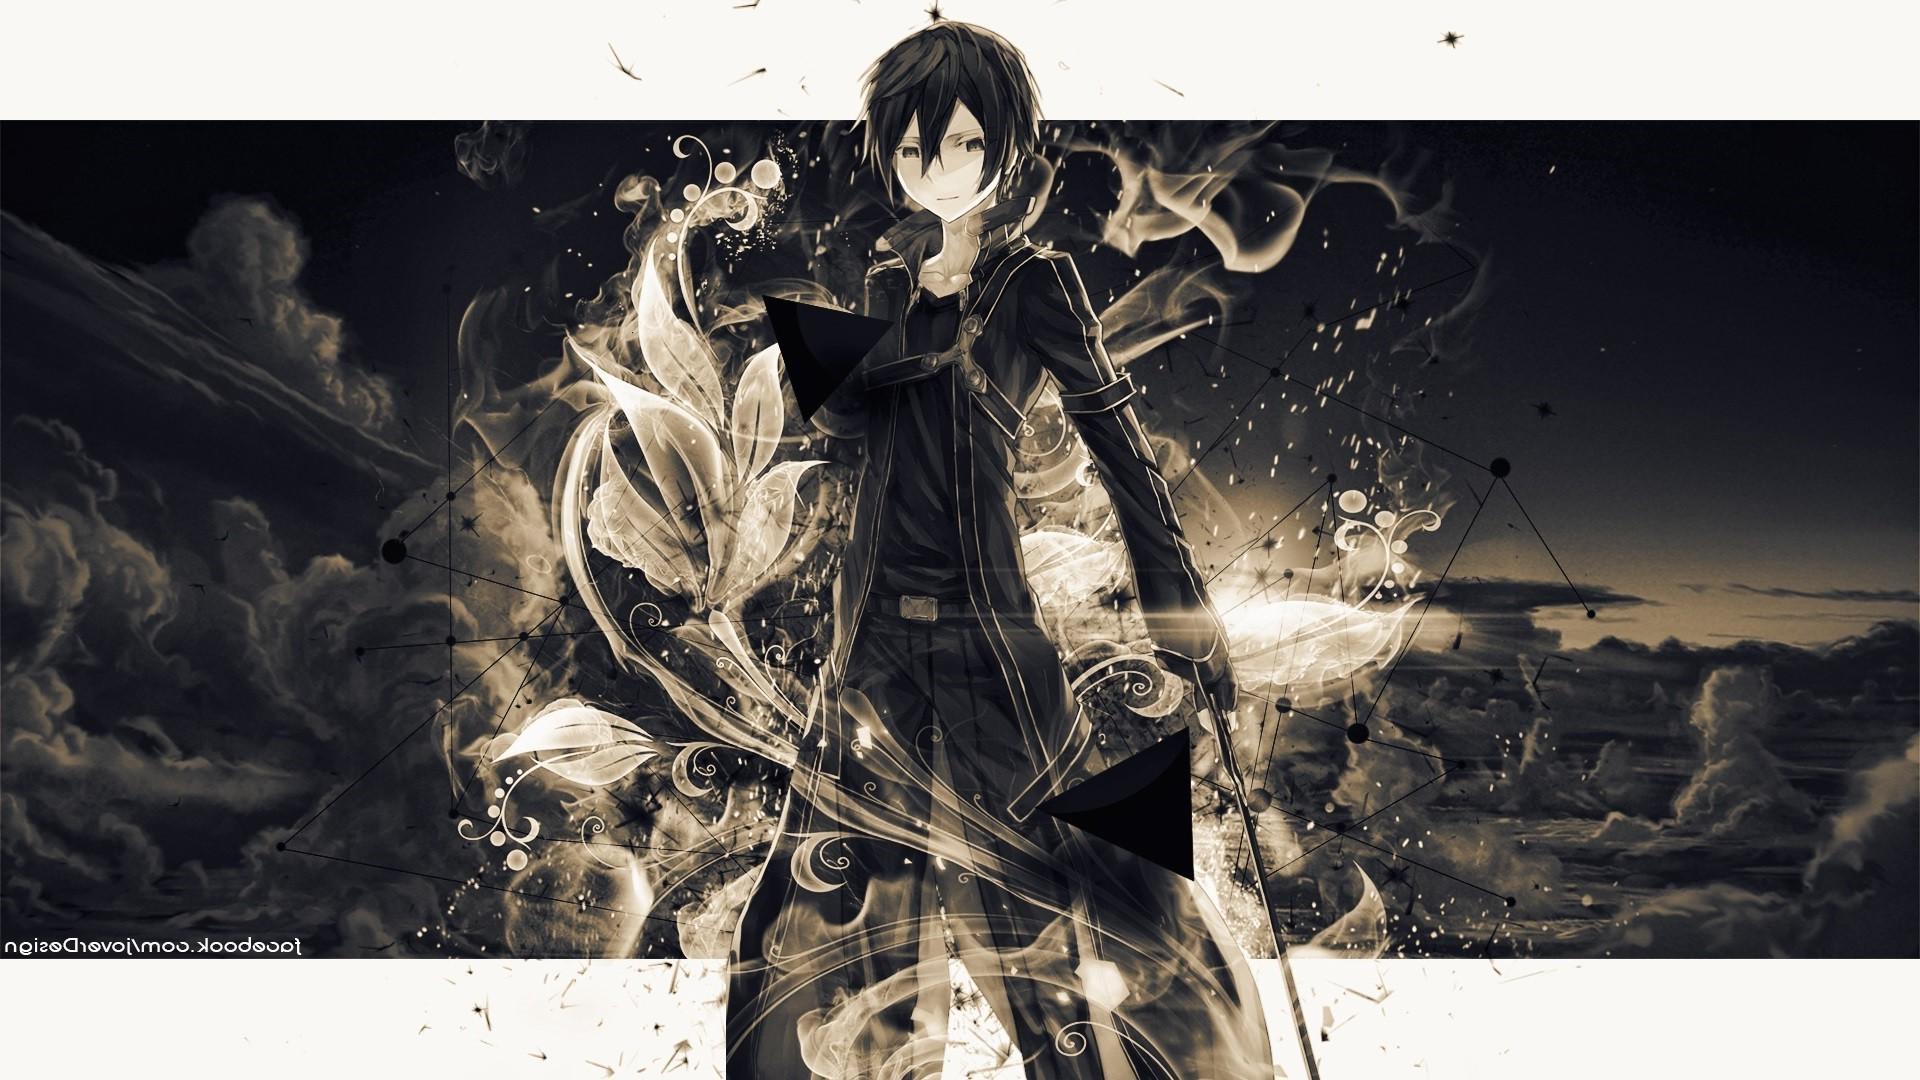 Illustration Monochrome Anime Sky Sword Art Online Kirigaya Kazuto Graphic Design ART Graphics 1920x1080 Px Computer